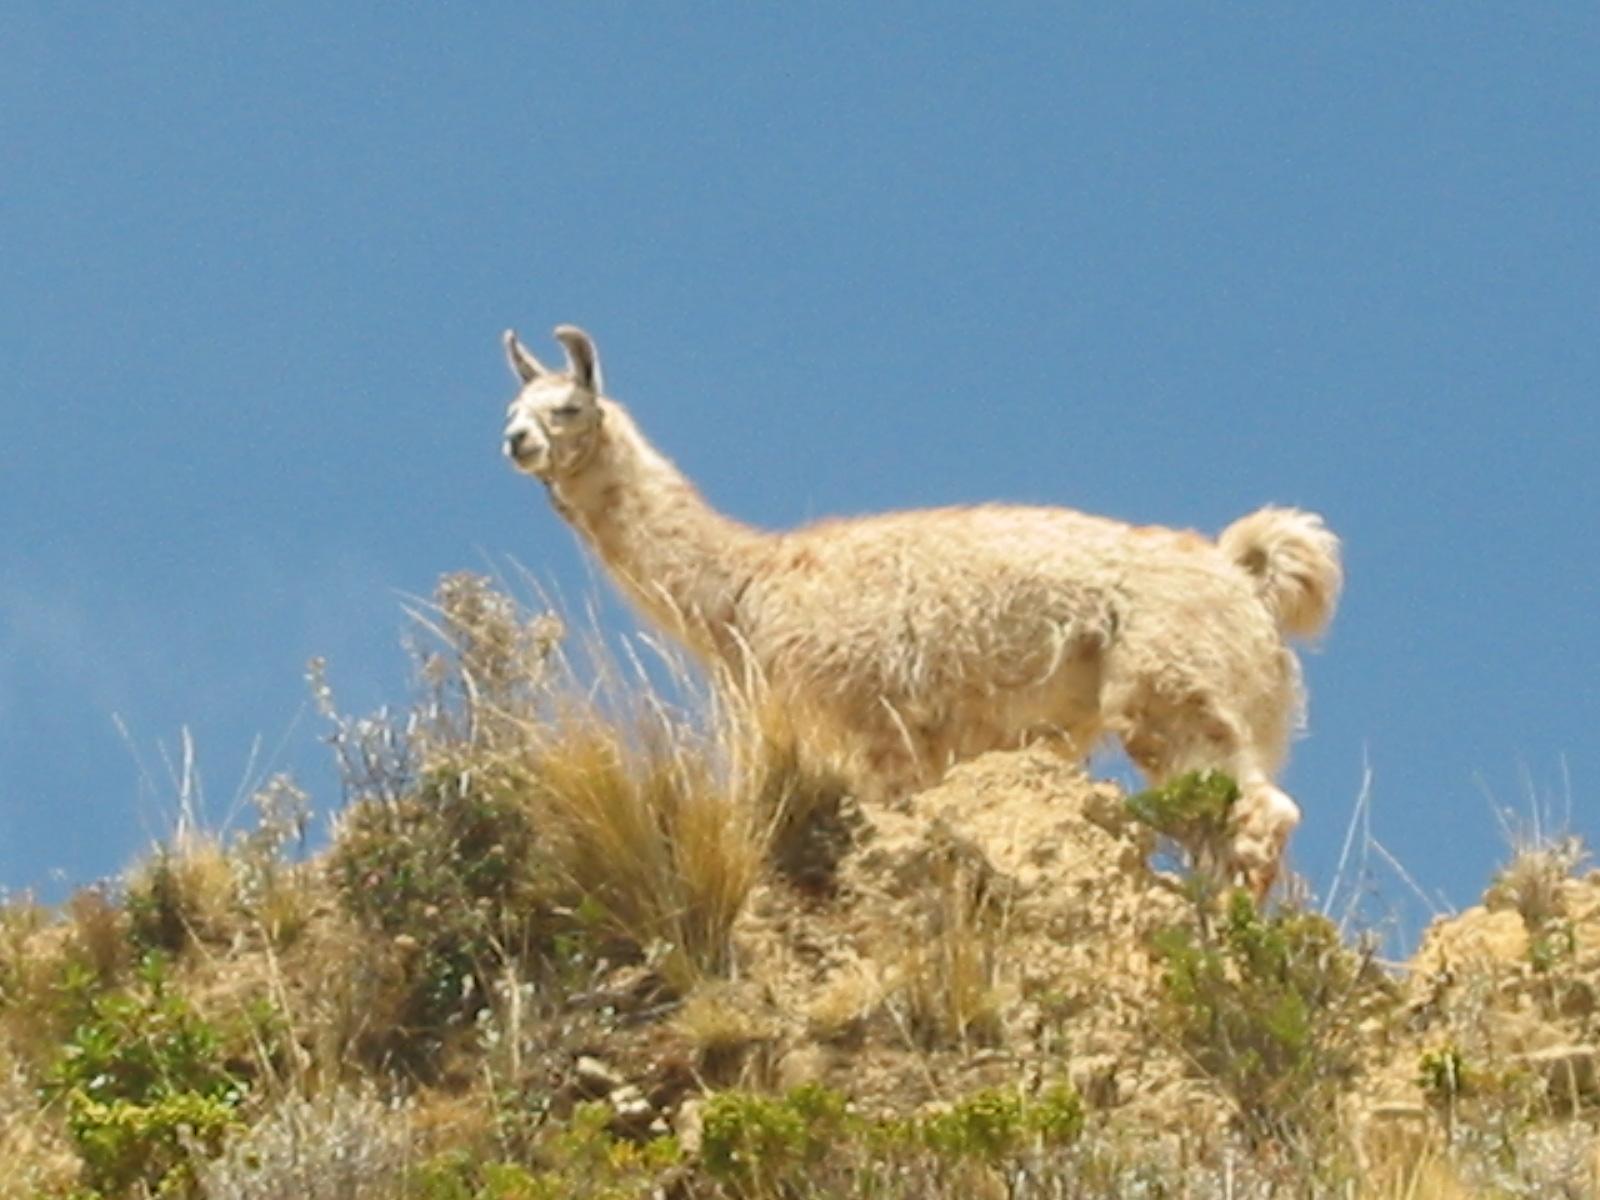 Alpaca roam freely on the island.